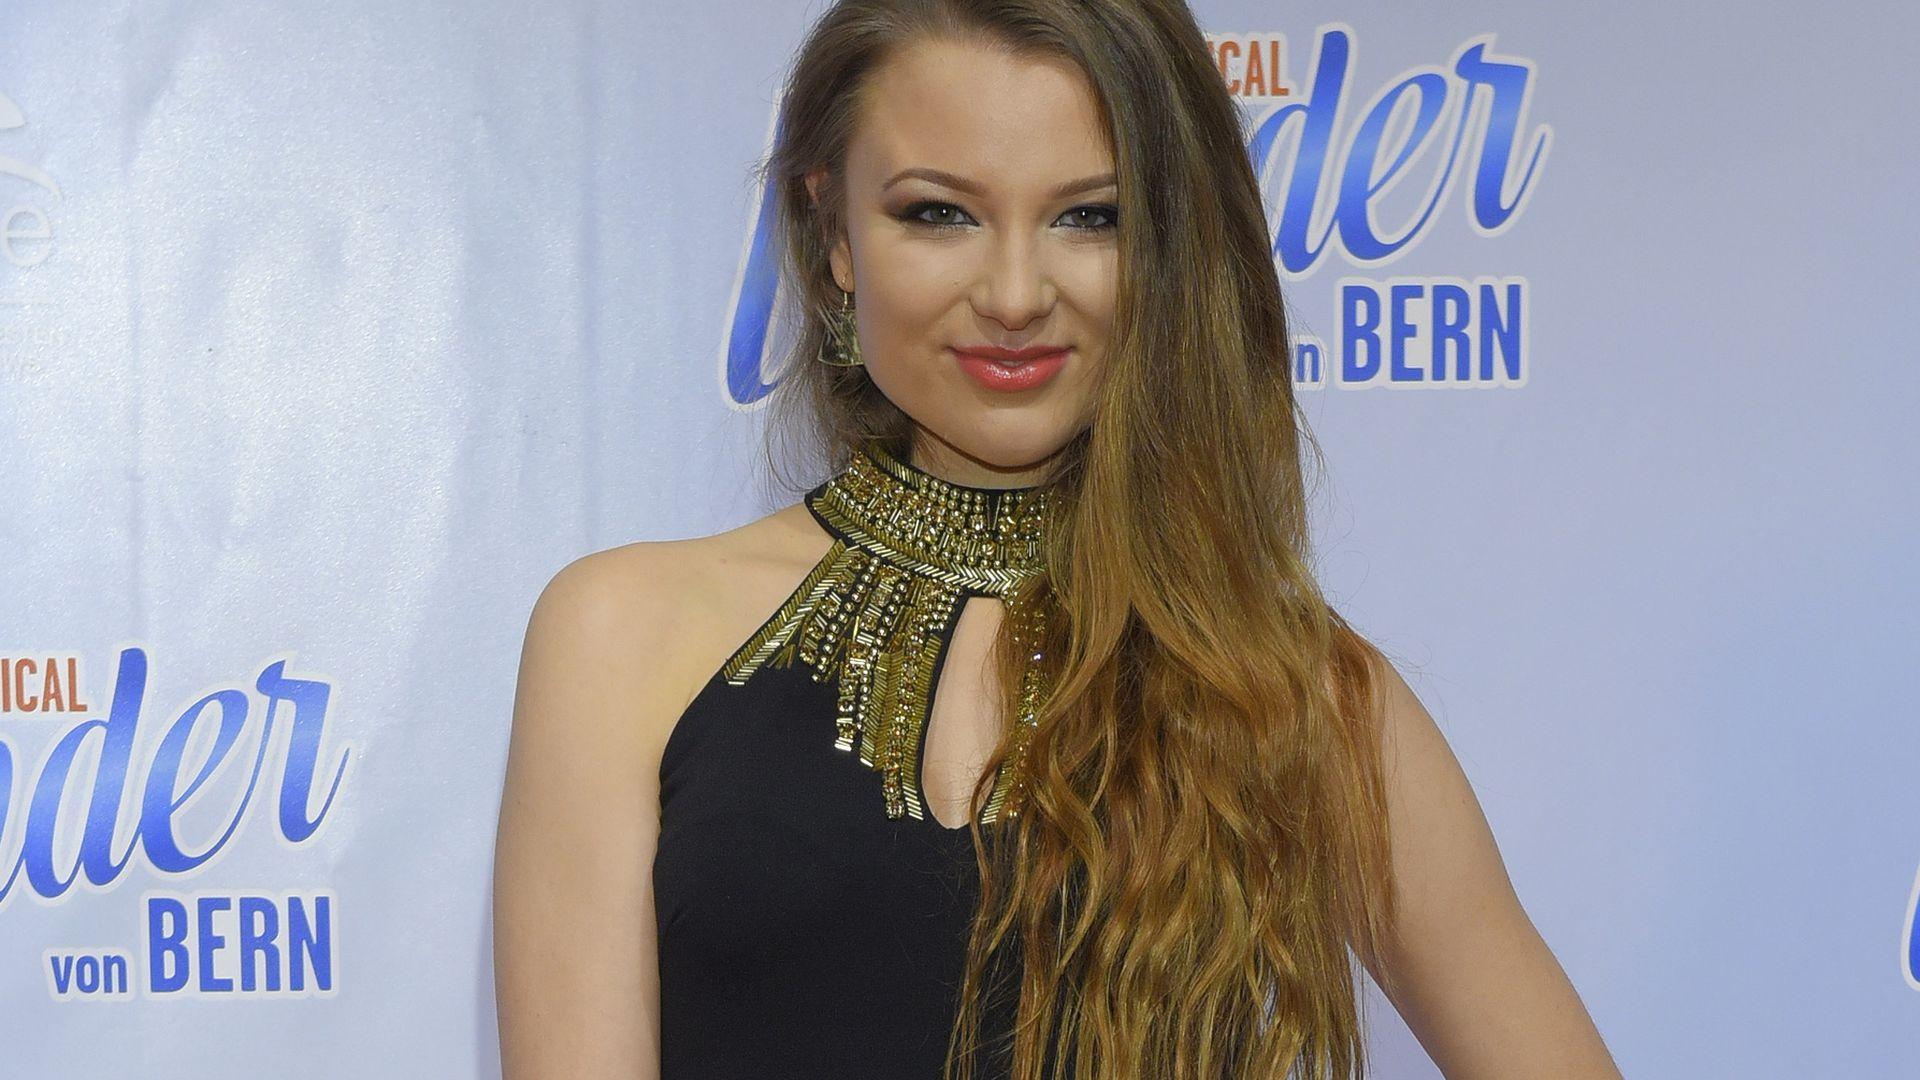 Joelina Drews 2014